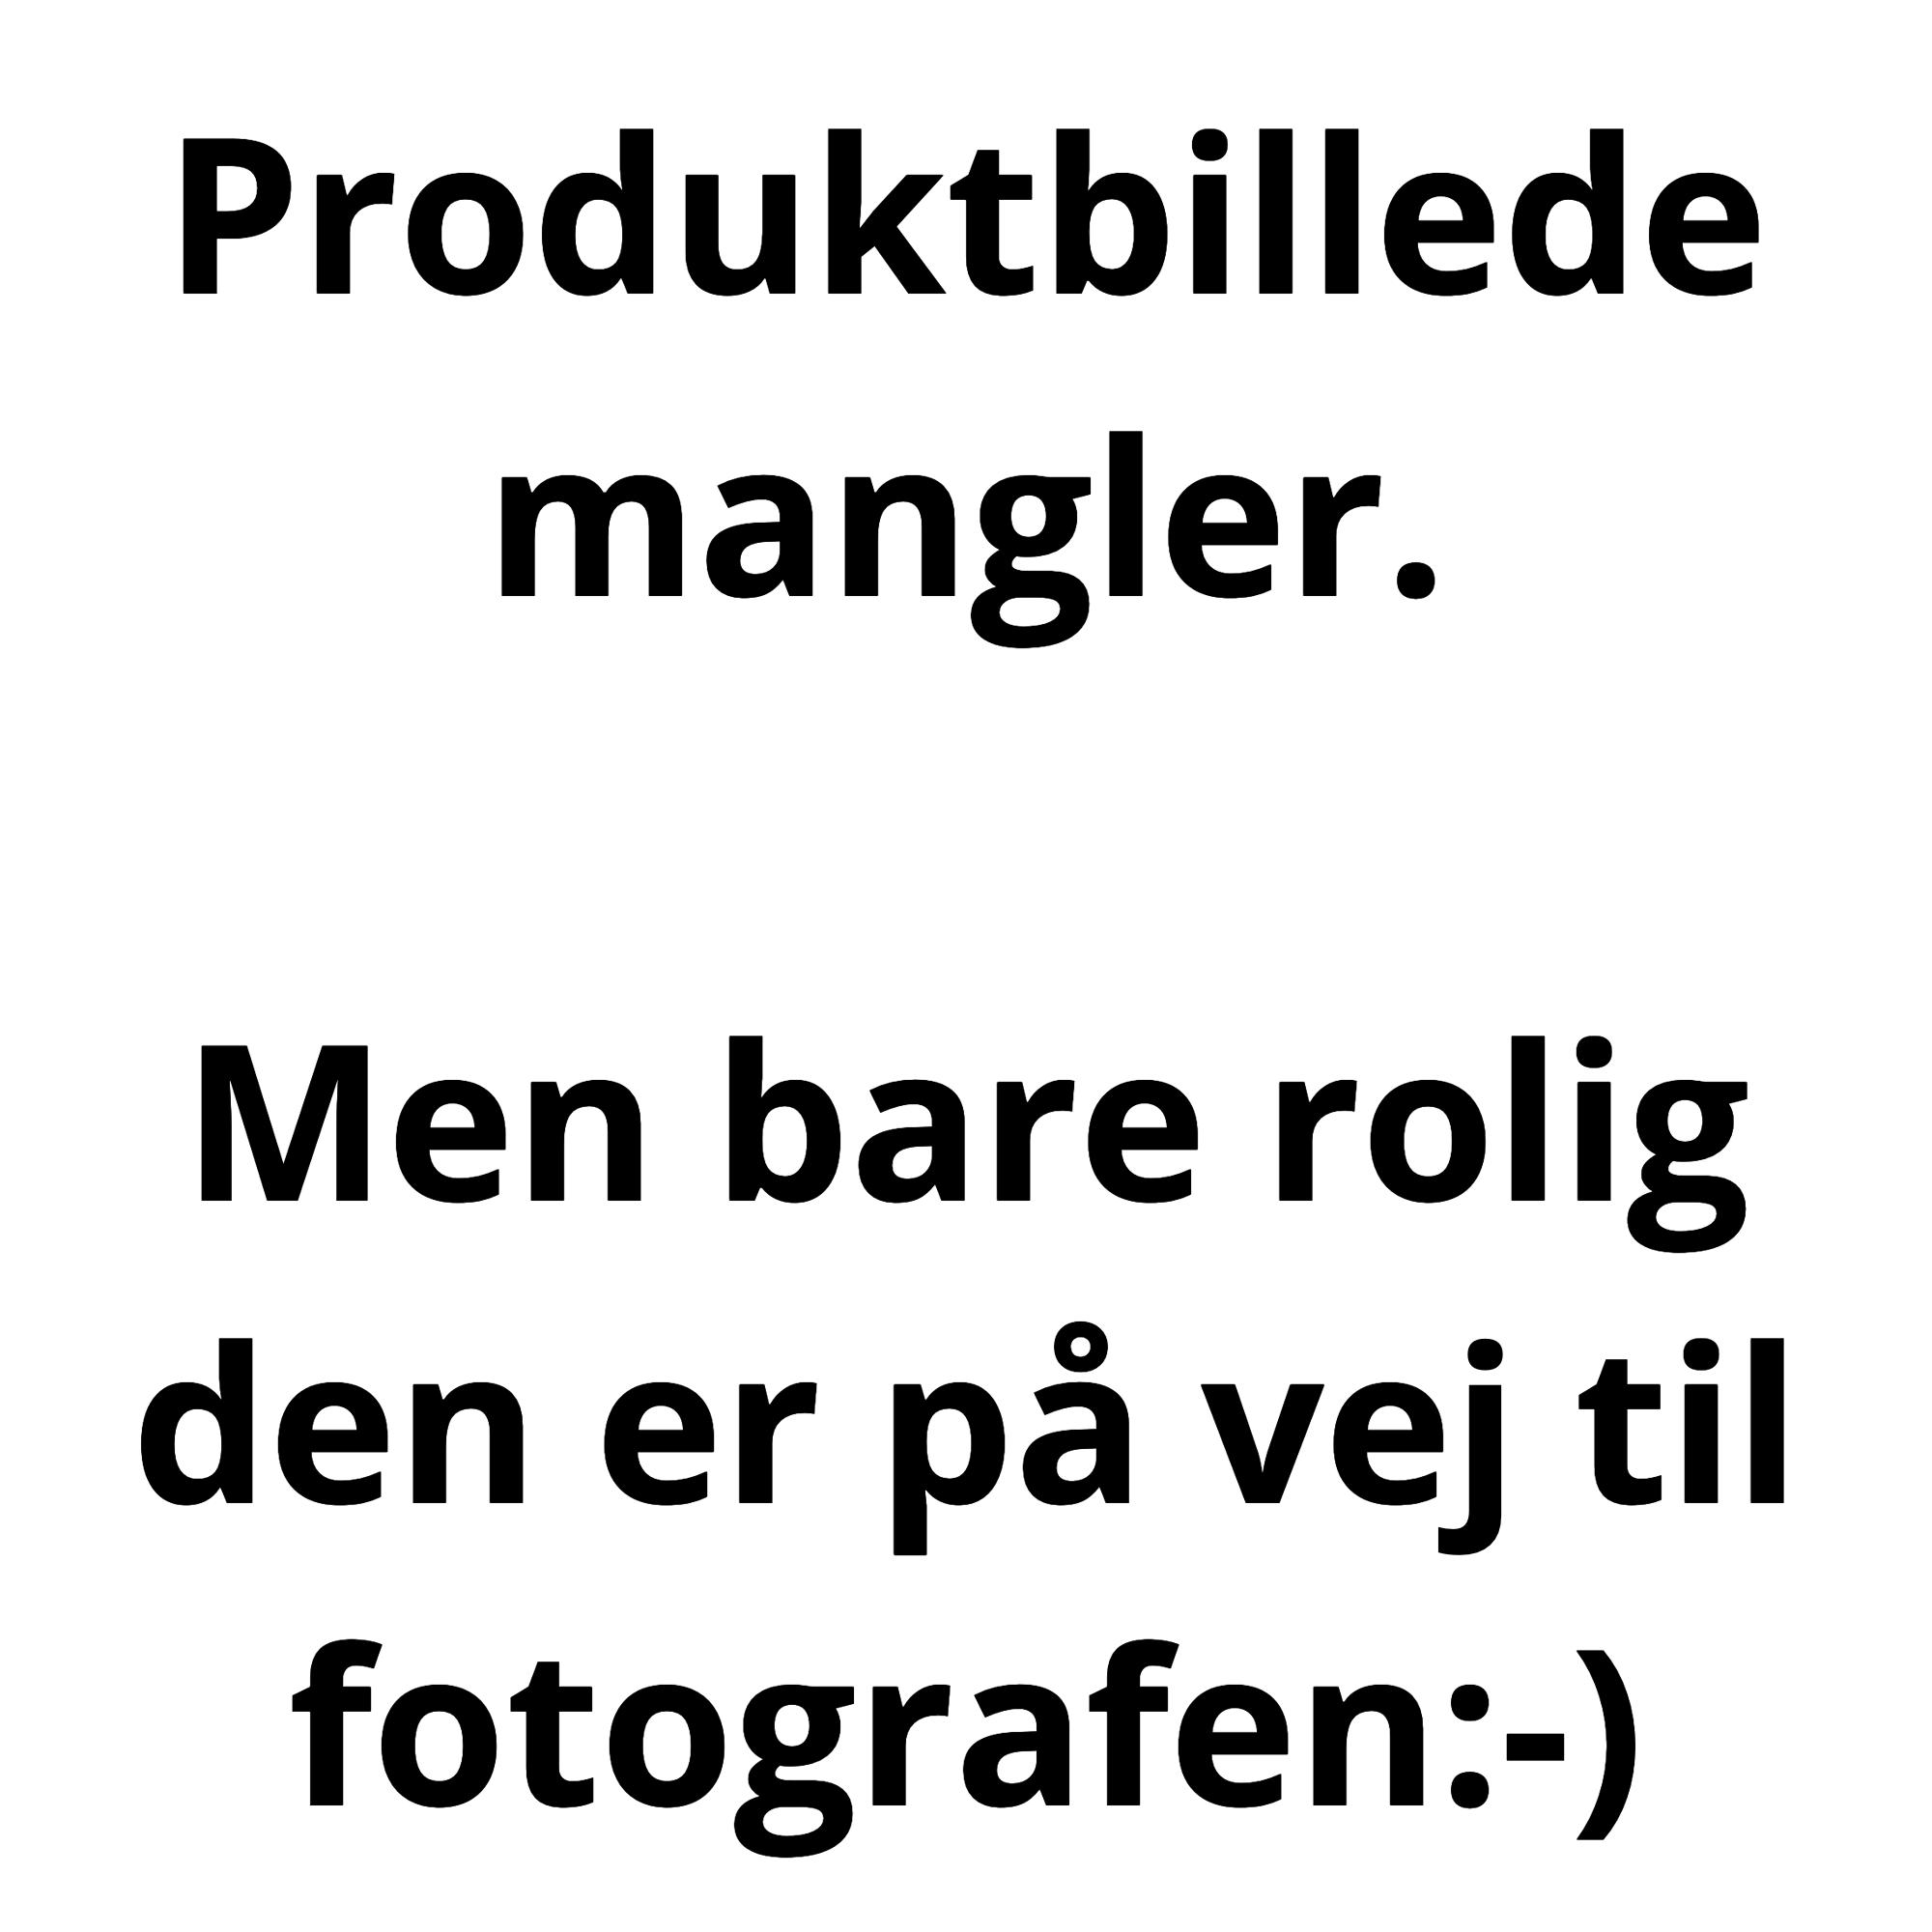 Brodit Aktiv mobilholder m. Cigar Adapter til Apple iPhone 6 Plus/6S Plus/7 Plus/8 Plus/Xs Max m. Beskyttelsescover - 521663